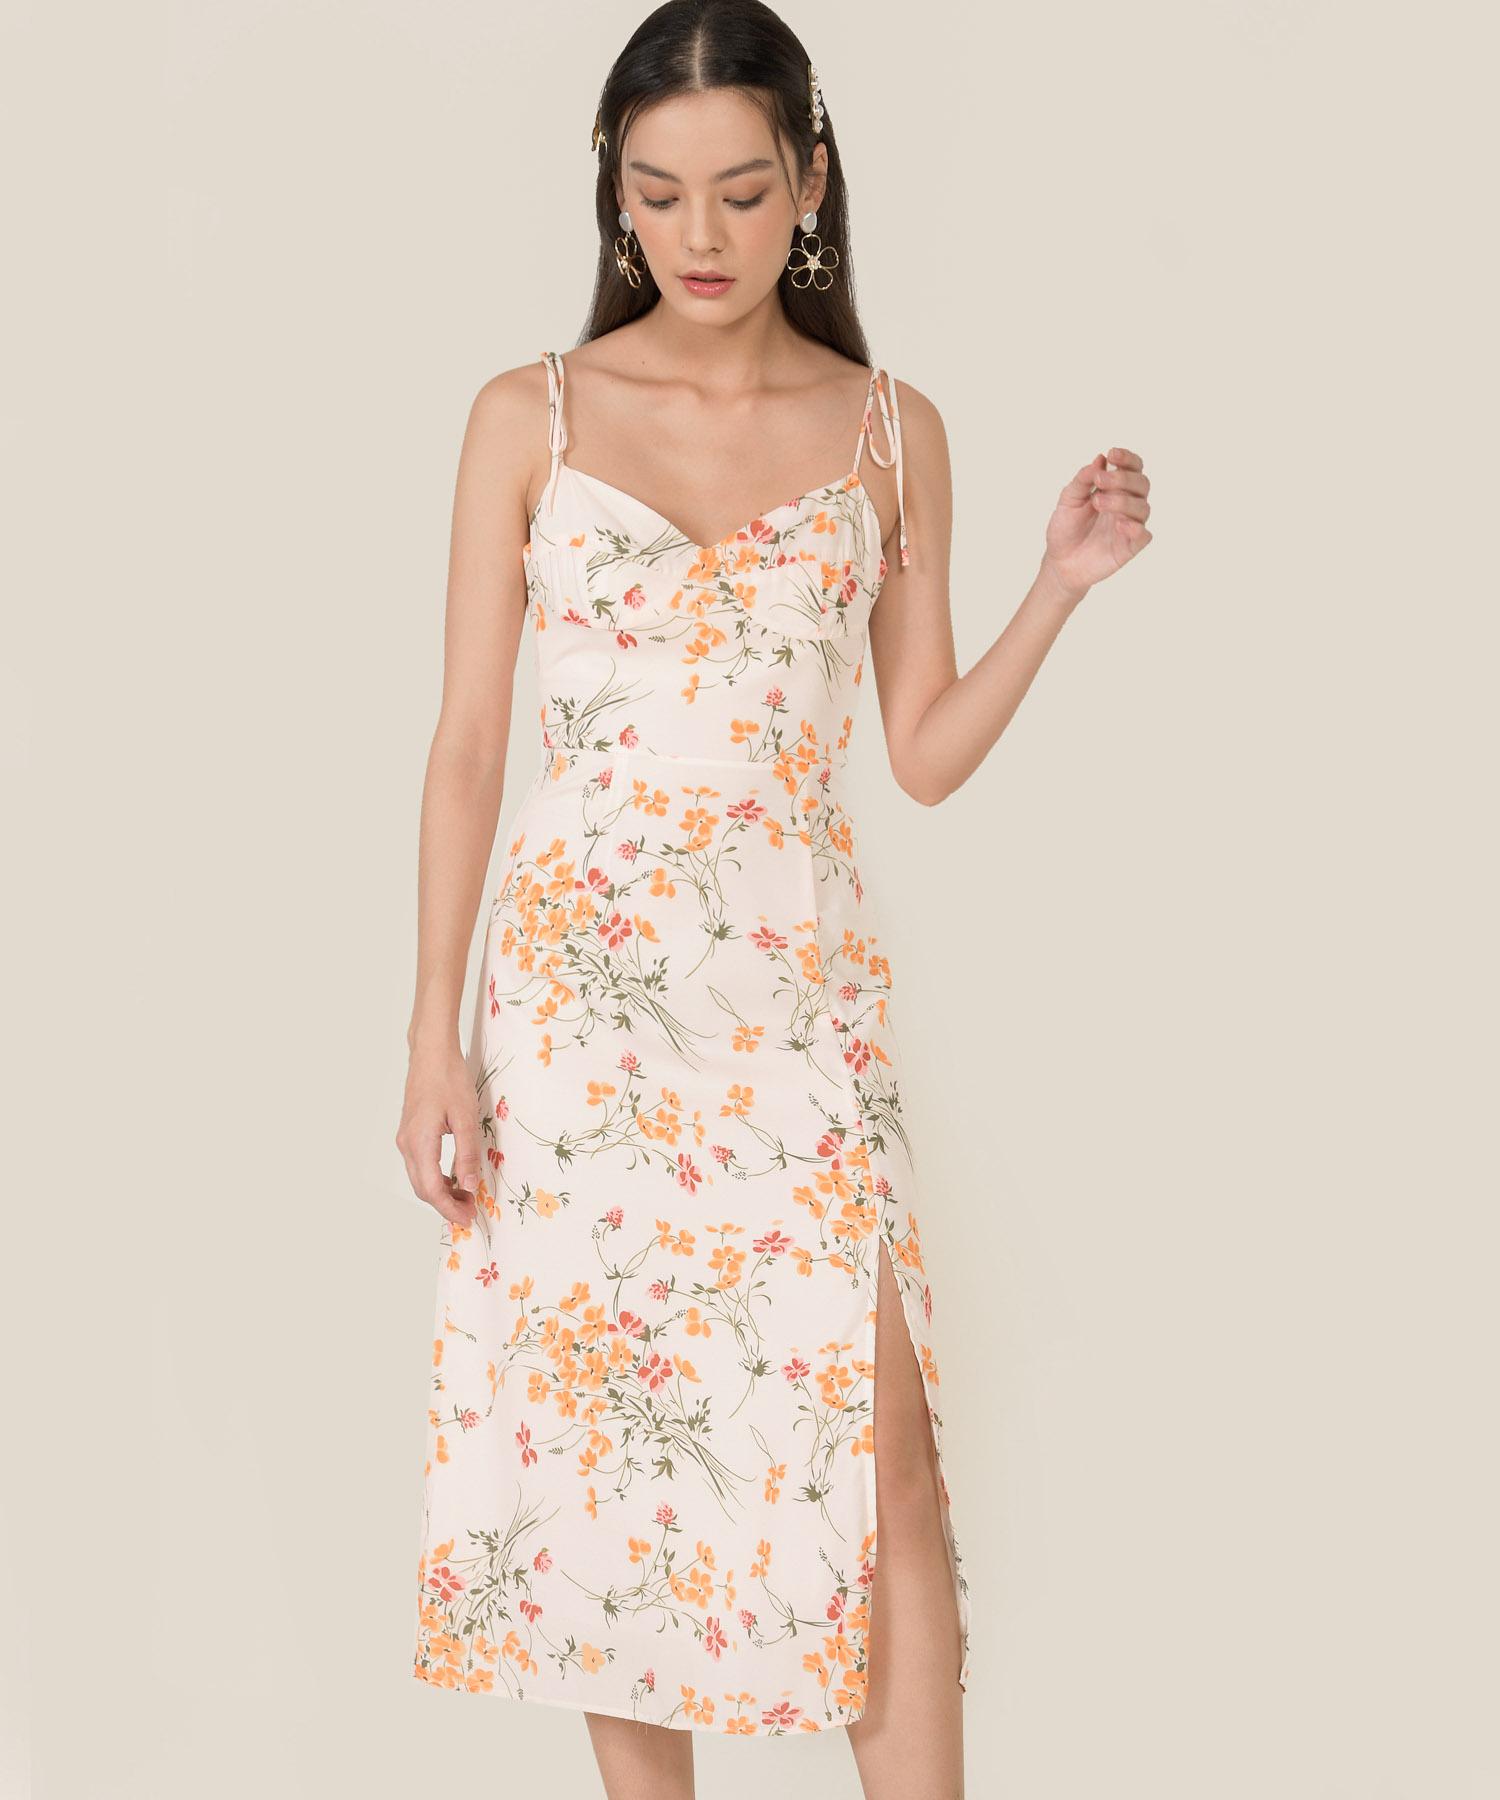 whistle-floral-tie-shoulder-midi-dress-cream-1